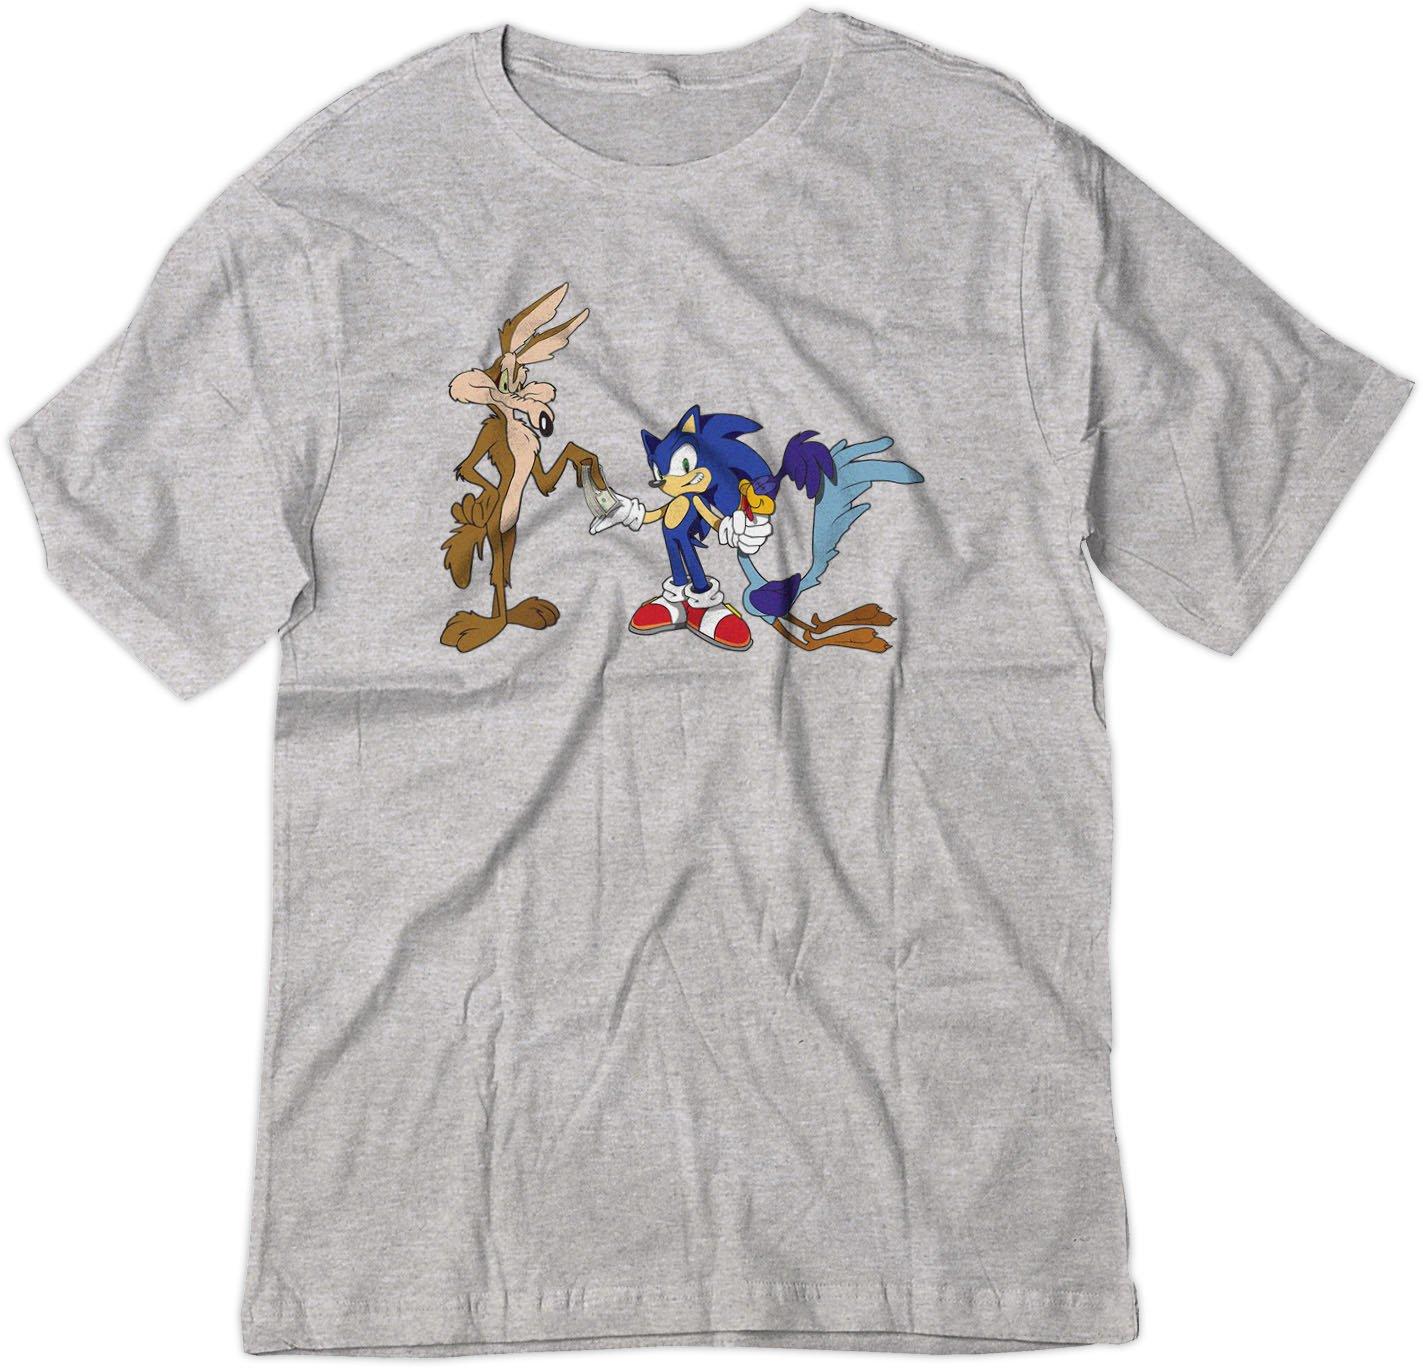 Roadrunner Coyote Pays Sonic Looney Theme Shirt Med Sport Grey 6397